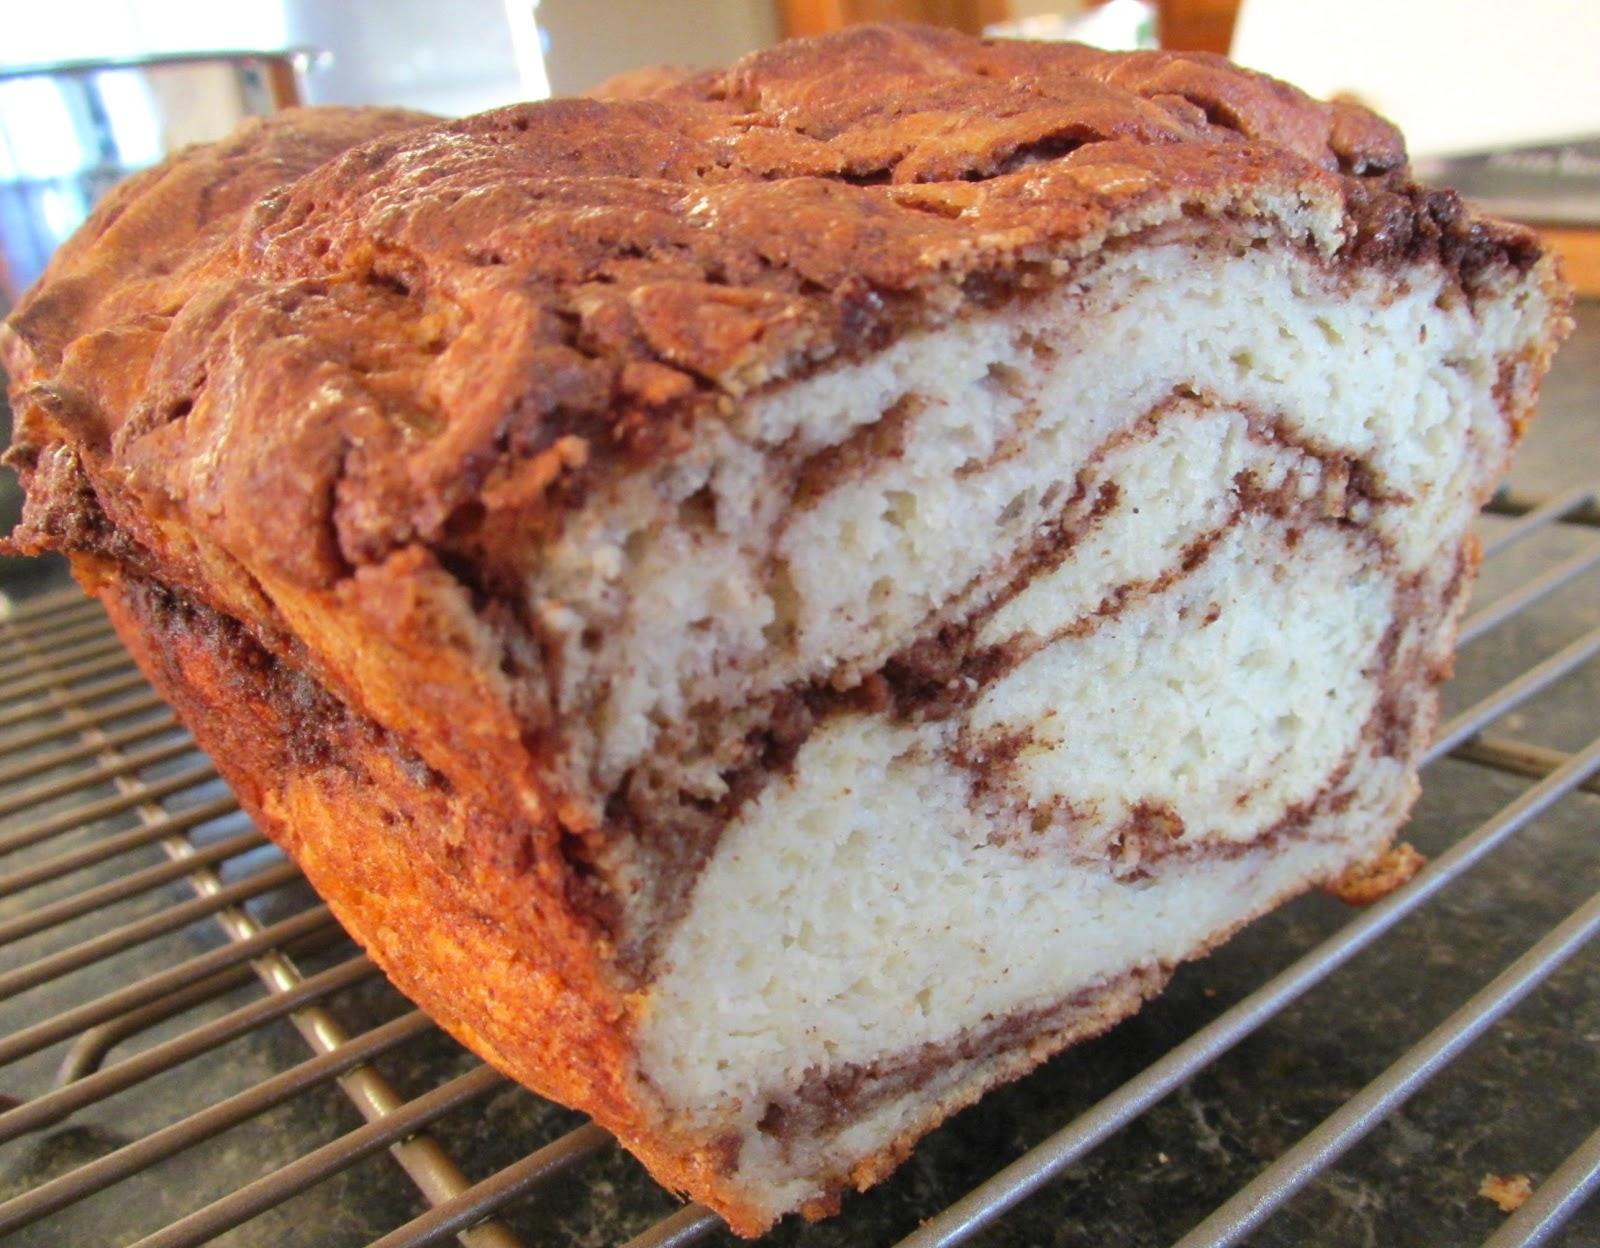 Successfully Gluten Free! : Gluten-Free Cinnamon Swirl Bread